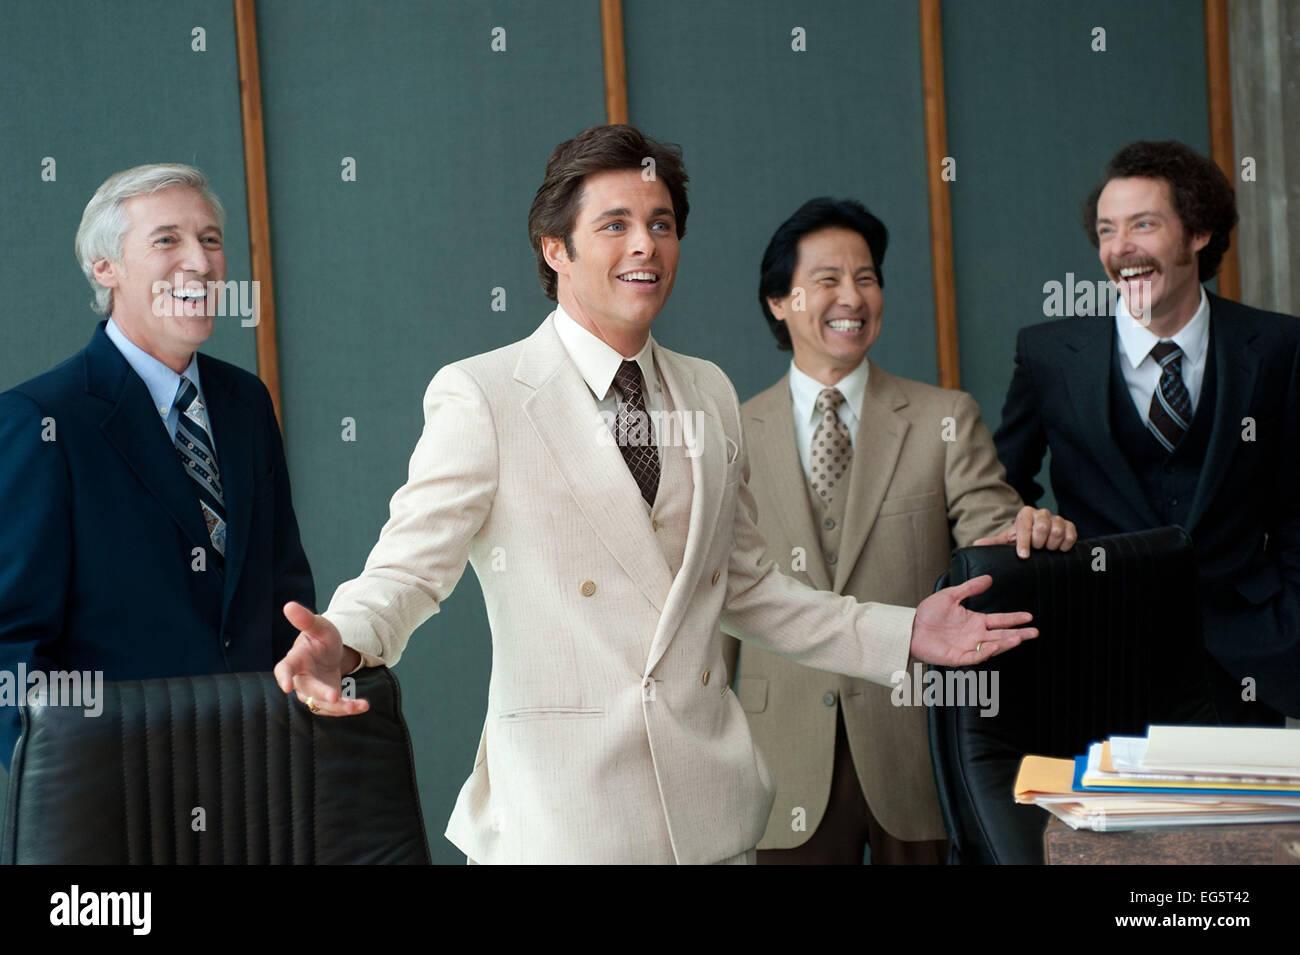 ANCHORMAN 2: THE LEGEND CONTINUES (2013) JAMES MARSDEN ADAM MCKAY (DIR) MOVIESTORE COLLECTION LTD Stock Photo